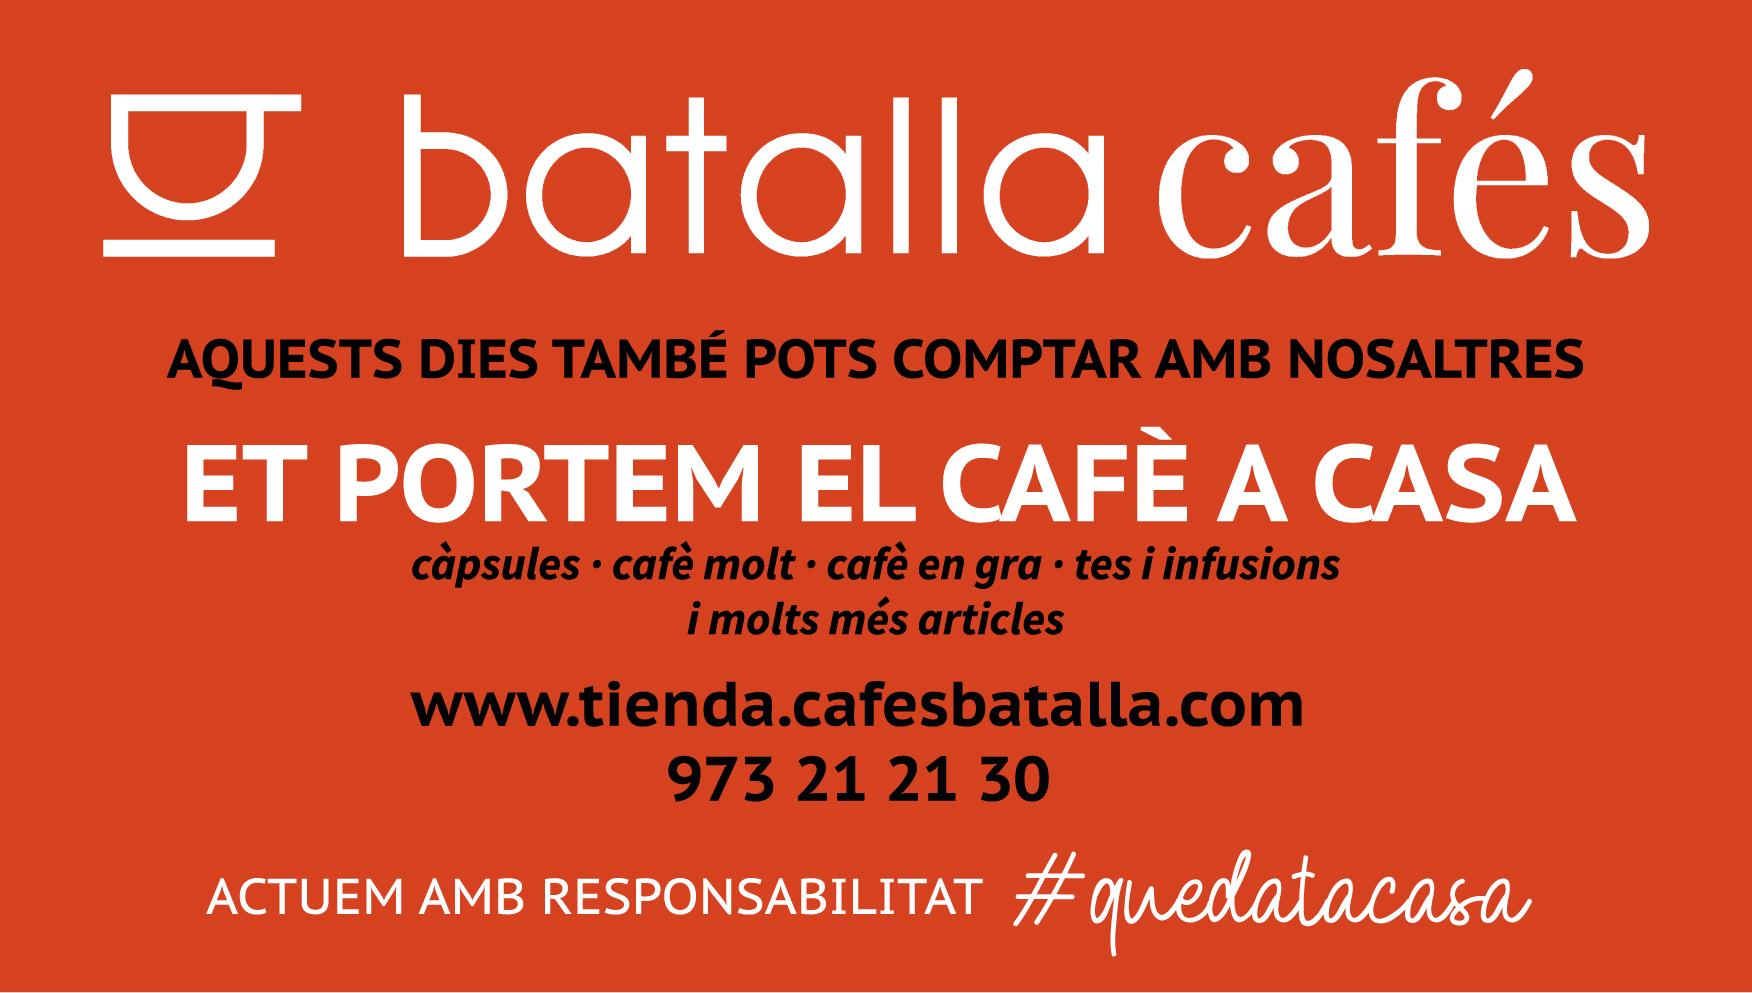 ET PORTEM EL CAFÊ A CASA – BATALLA CAFÈS